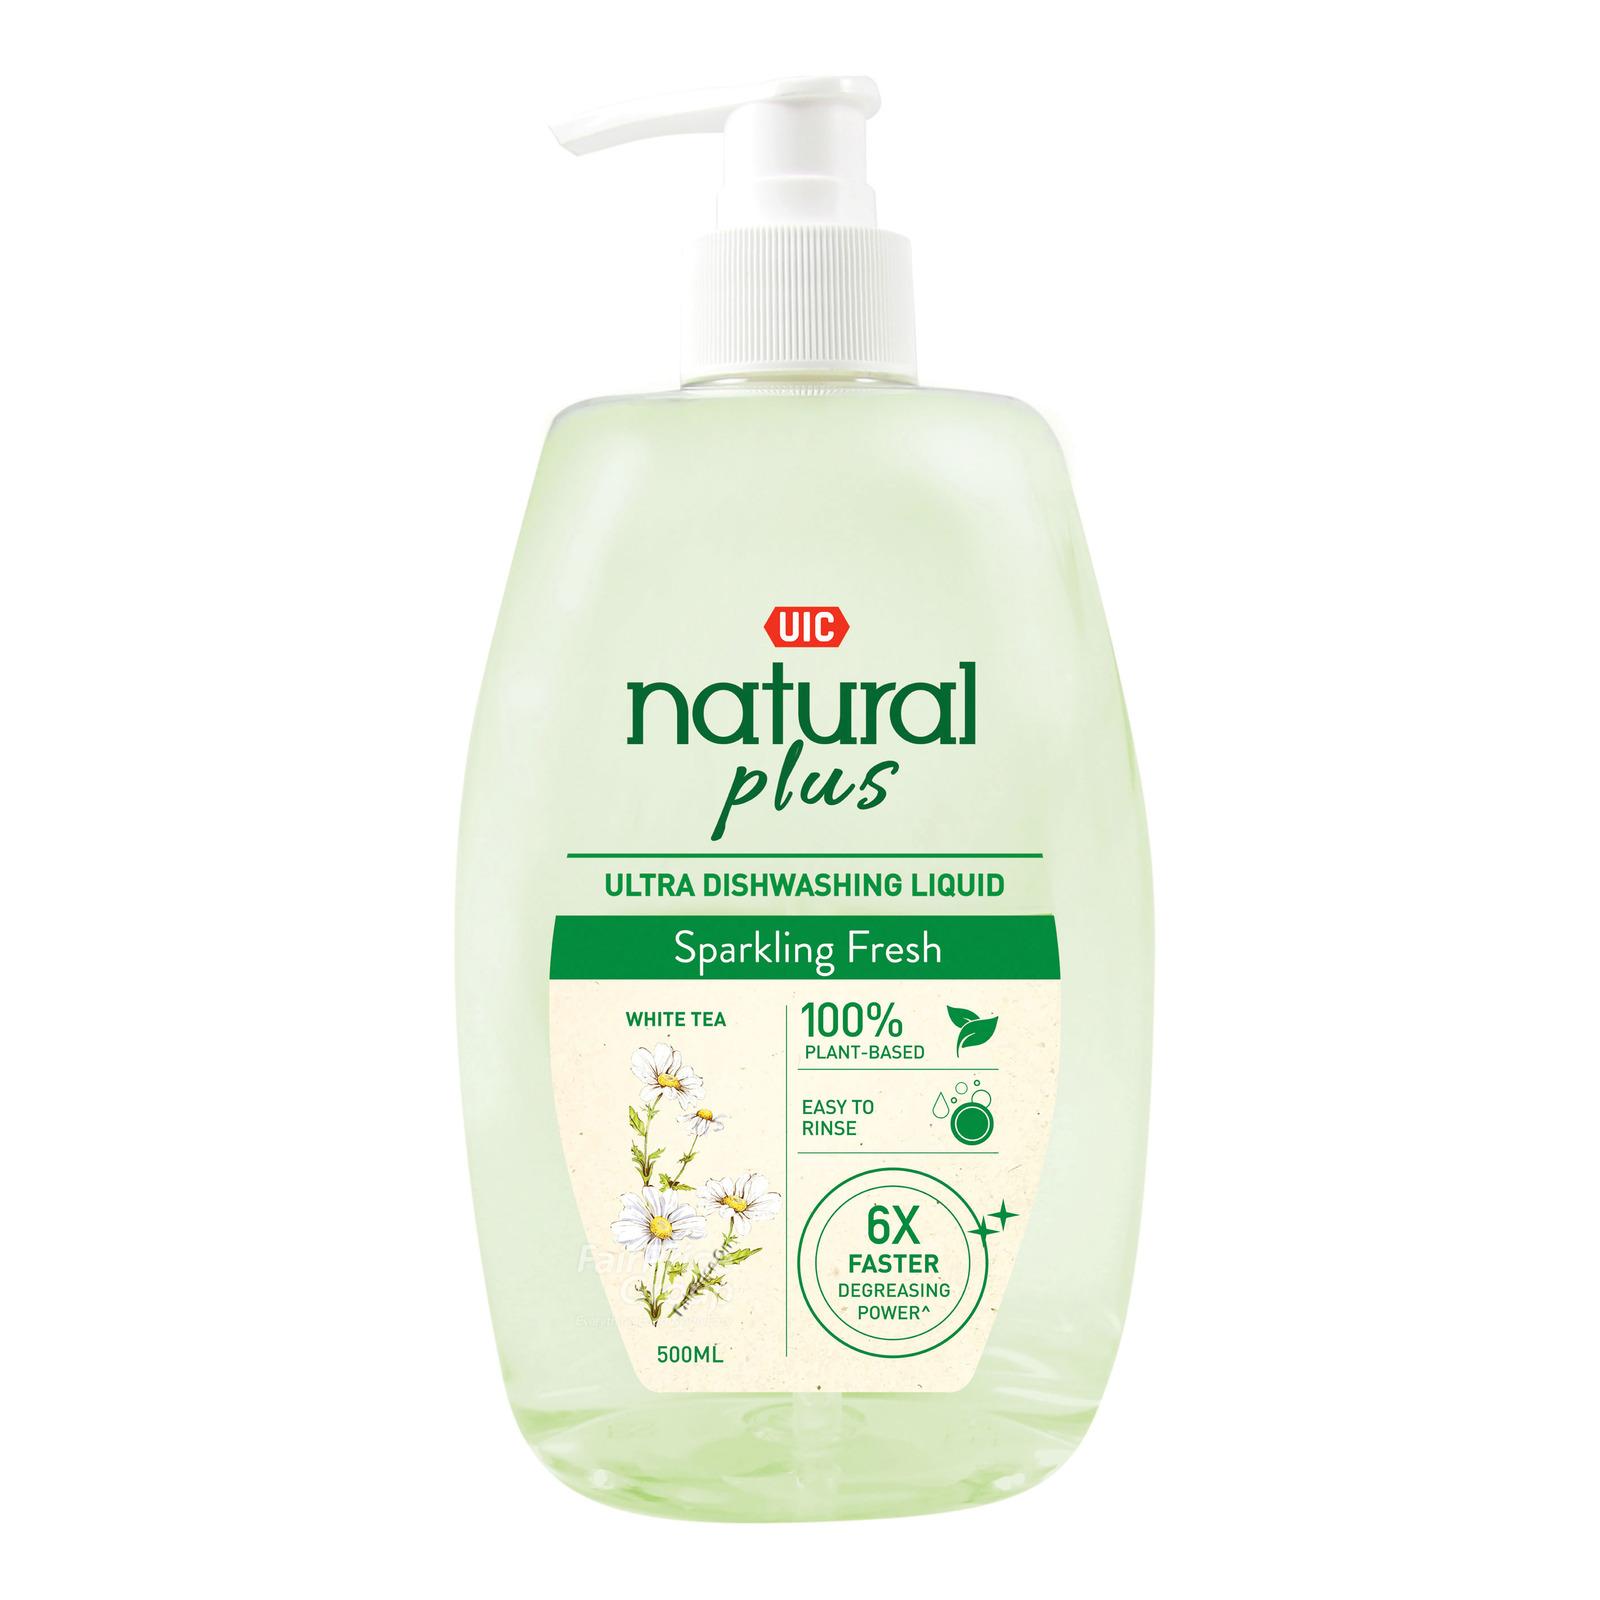 UIC Natural Plus Ultra Dishwashing Liquid - Sparkling Fresh